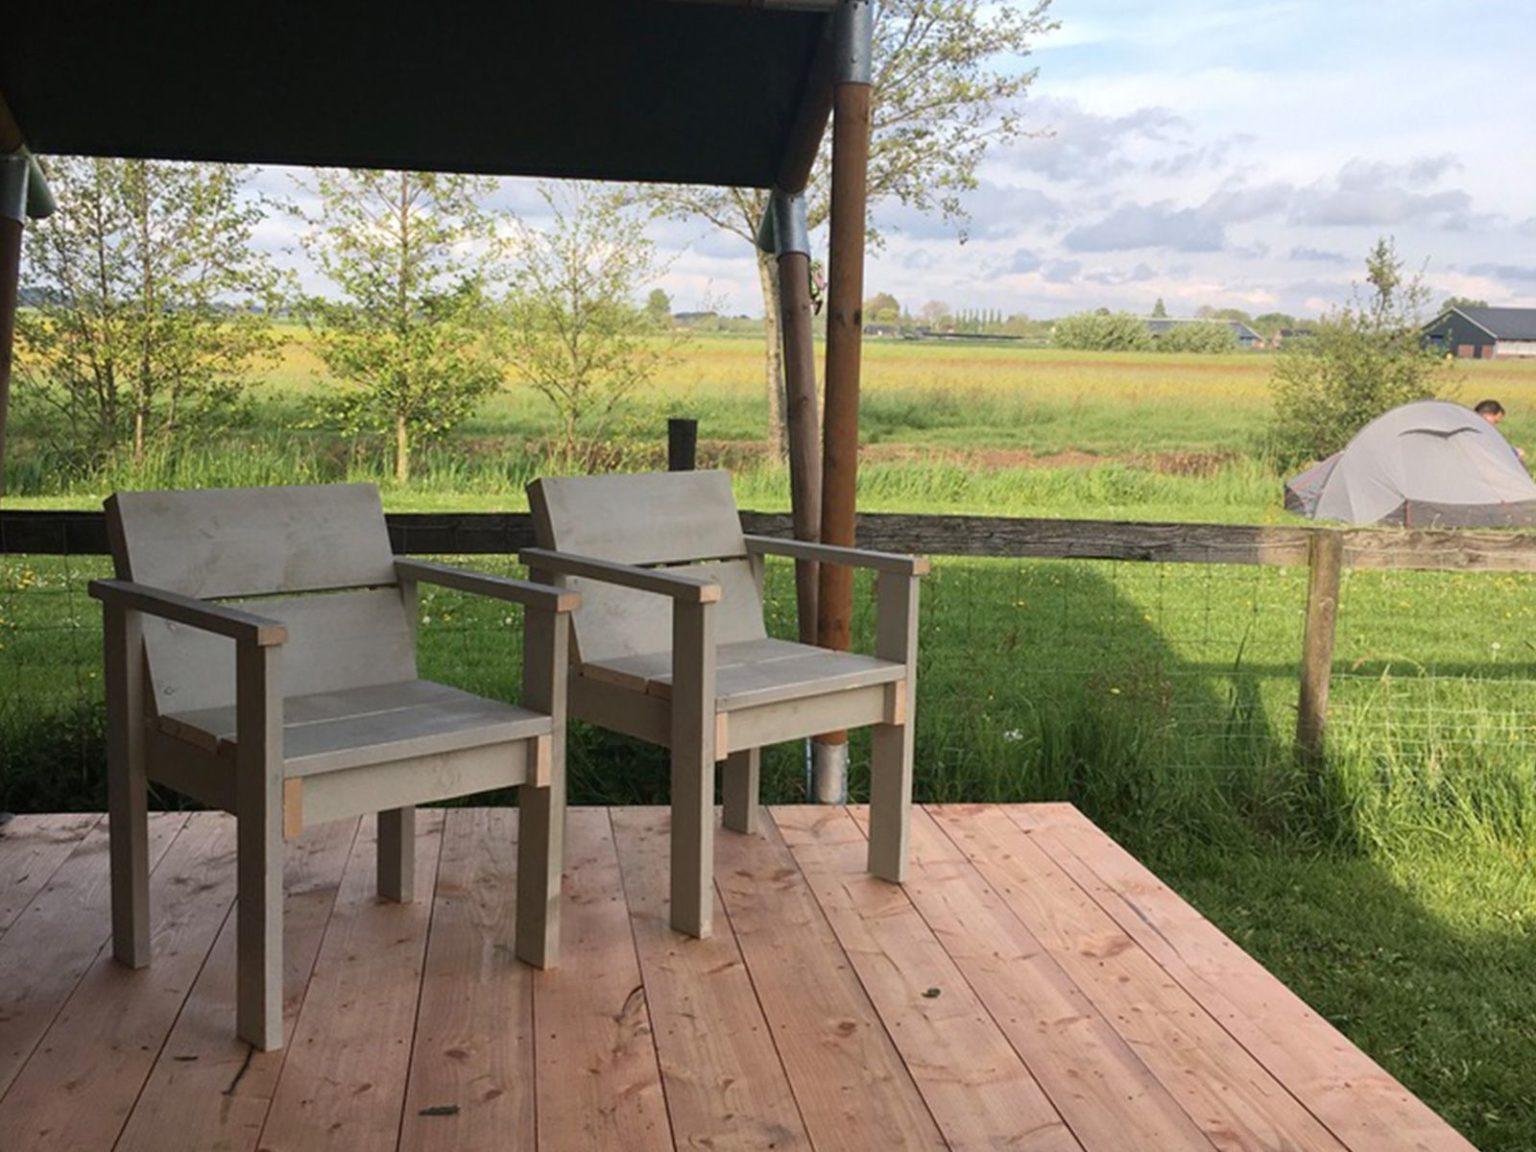 bijgroengeluk-beelden-accommodatie-accommodation-safaritent-uitzicht-safaritent-3